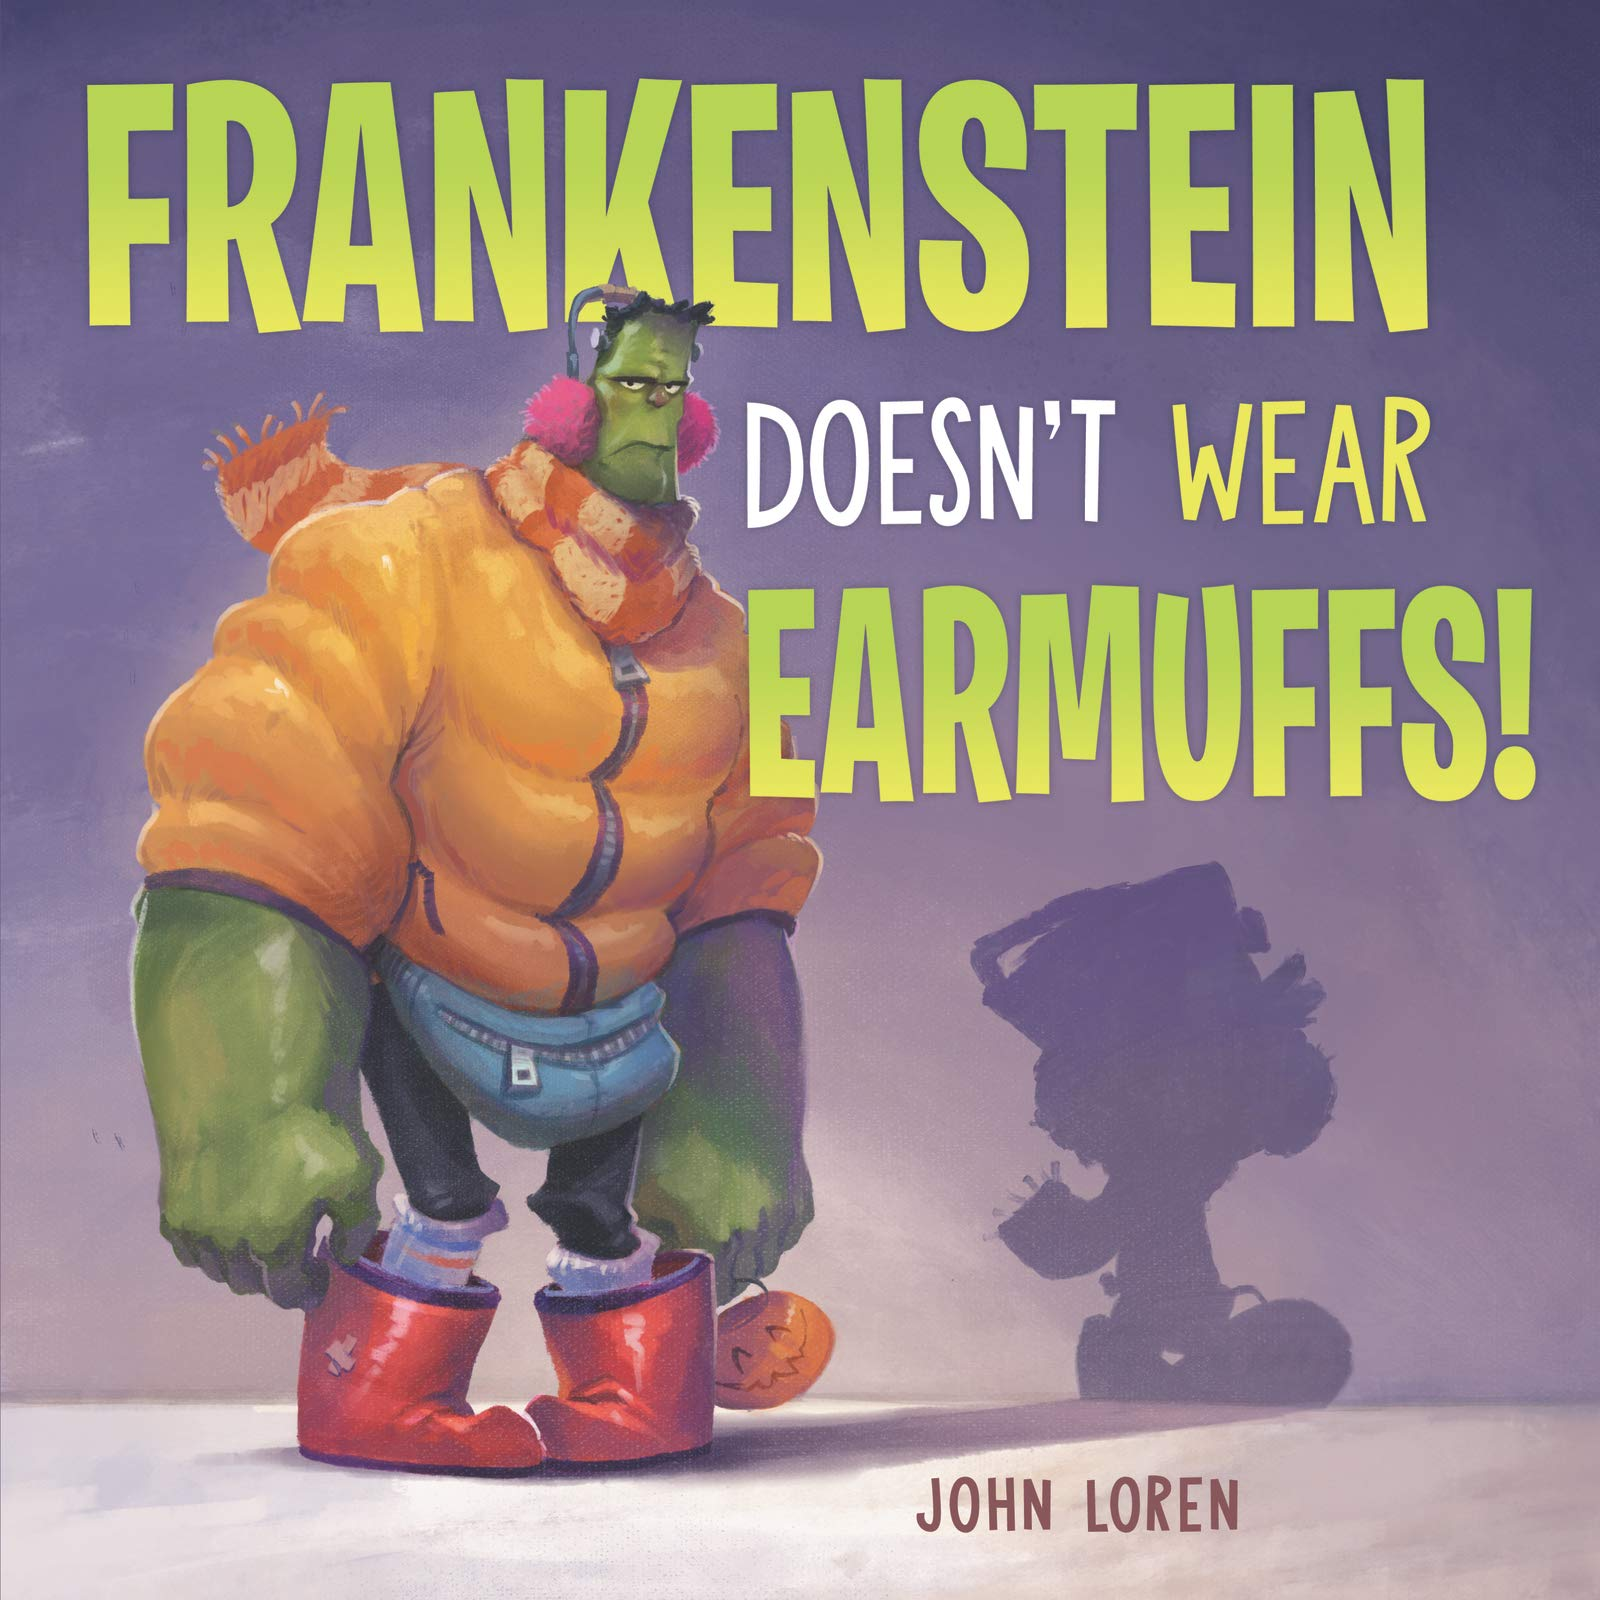 Amazon.com: Frankenstein Doesn't Wear Earmuffs!: 9780062941145: Loren, John, Loren, John: Books